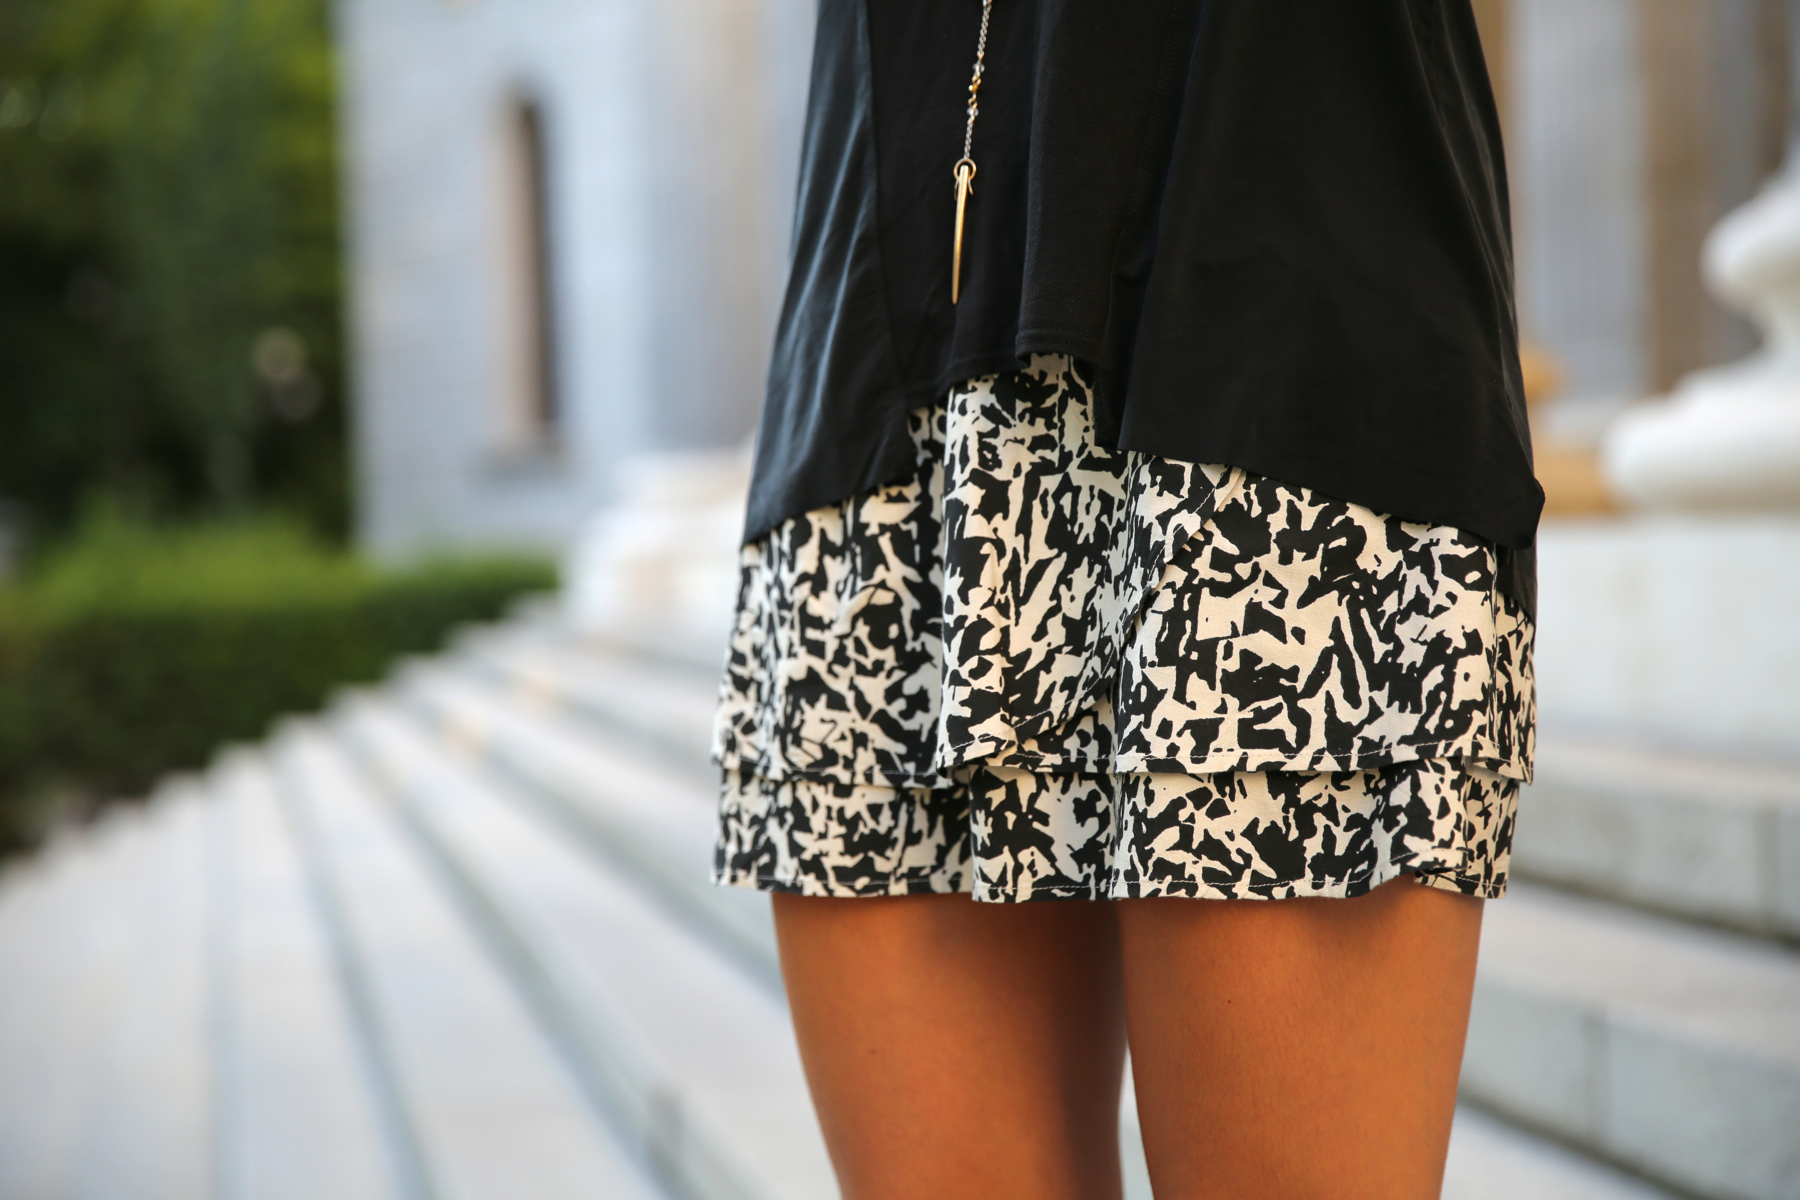 trendy_taste-look-outfit-street_style-ootd-blog-blogger-fashion_spain-moda_españa-animal_print-boho-casual-falda-skirt-black_booties-botines_negros-jeffrey_campbell-zara-bolso_flecos-vintage-2